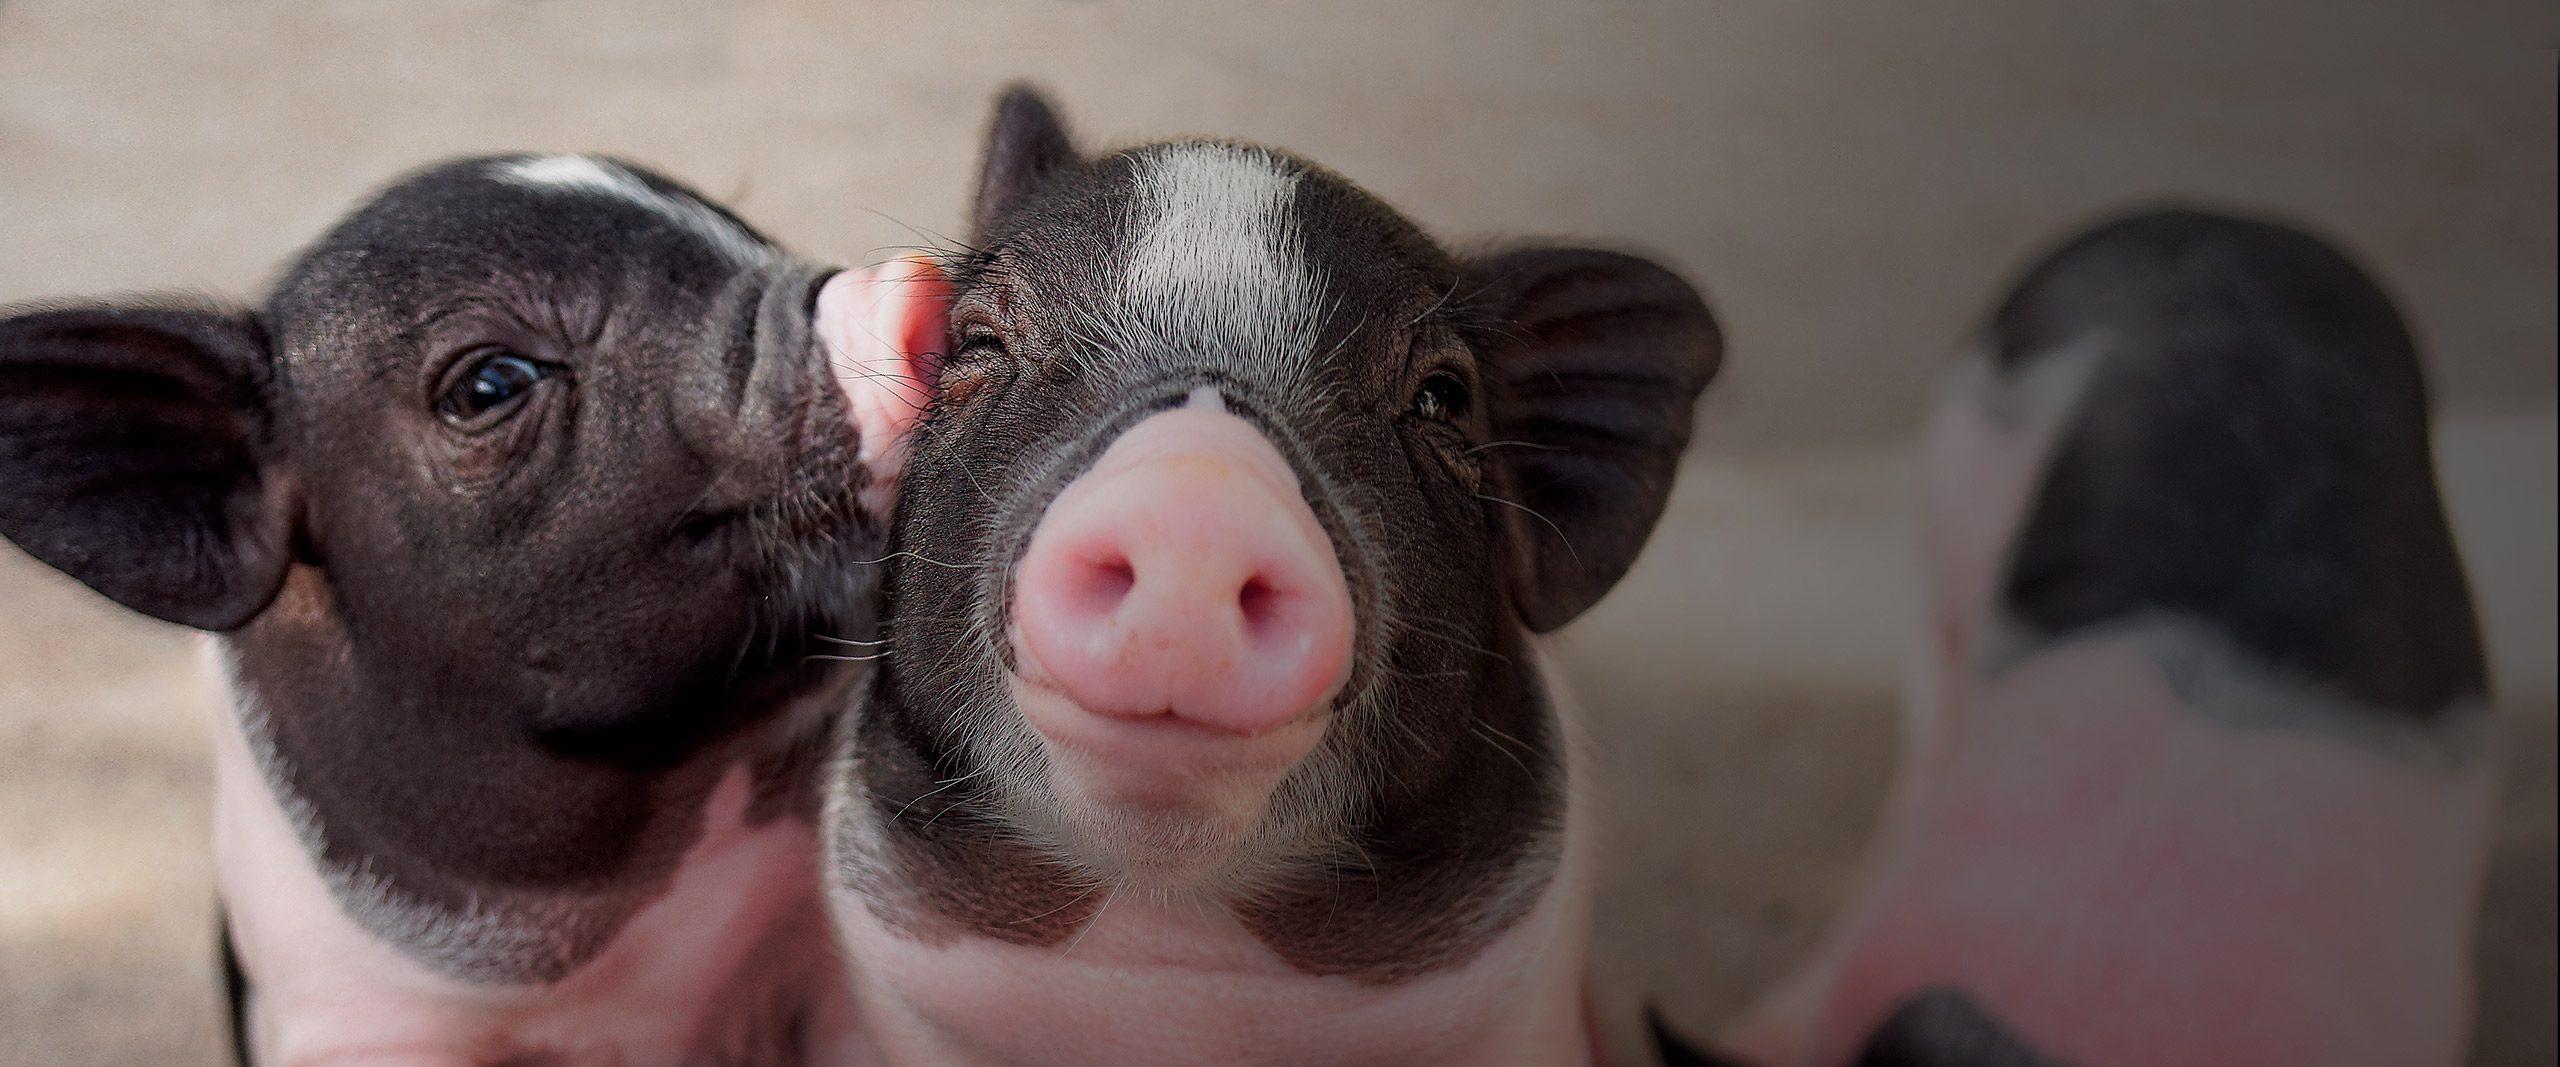 Piglets - Animal Equality